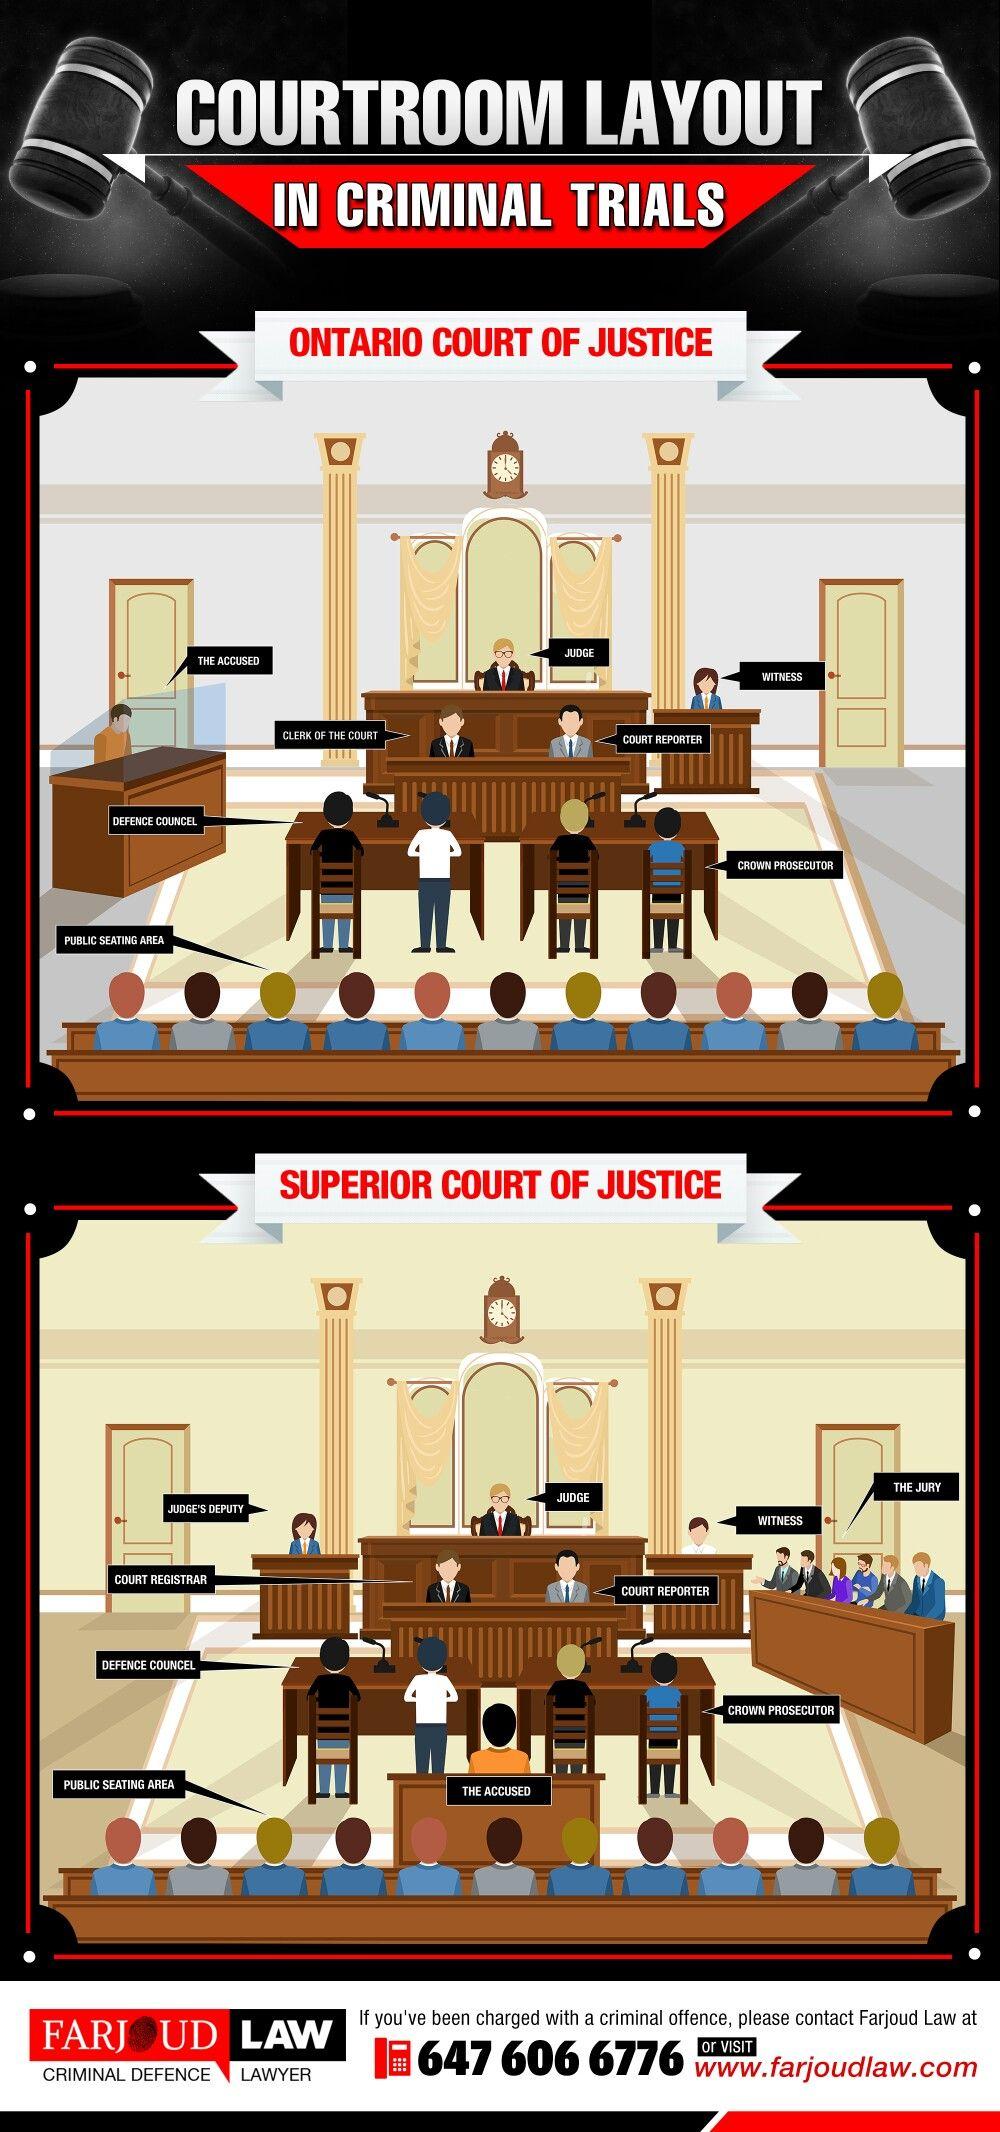 courtroom layout in criminal trials courtroom layout in. Black Bedroom Furniture Sets. Home Design Ideas